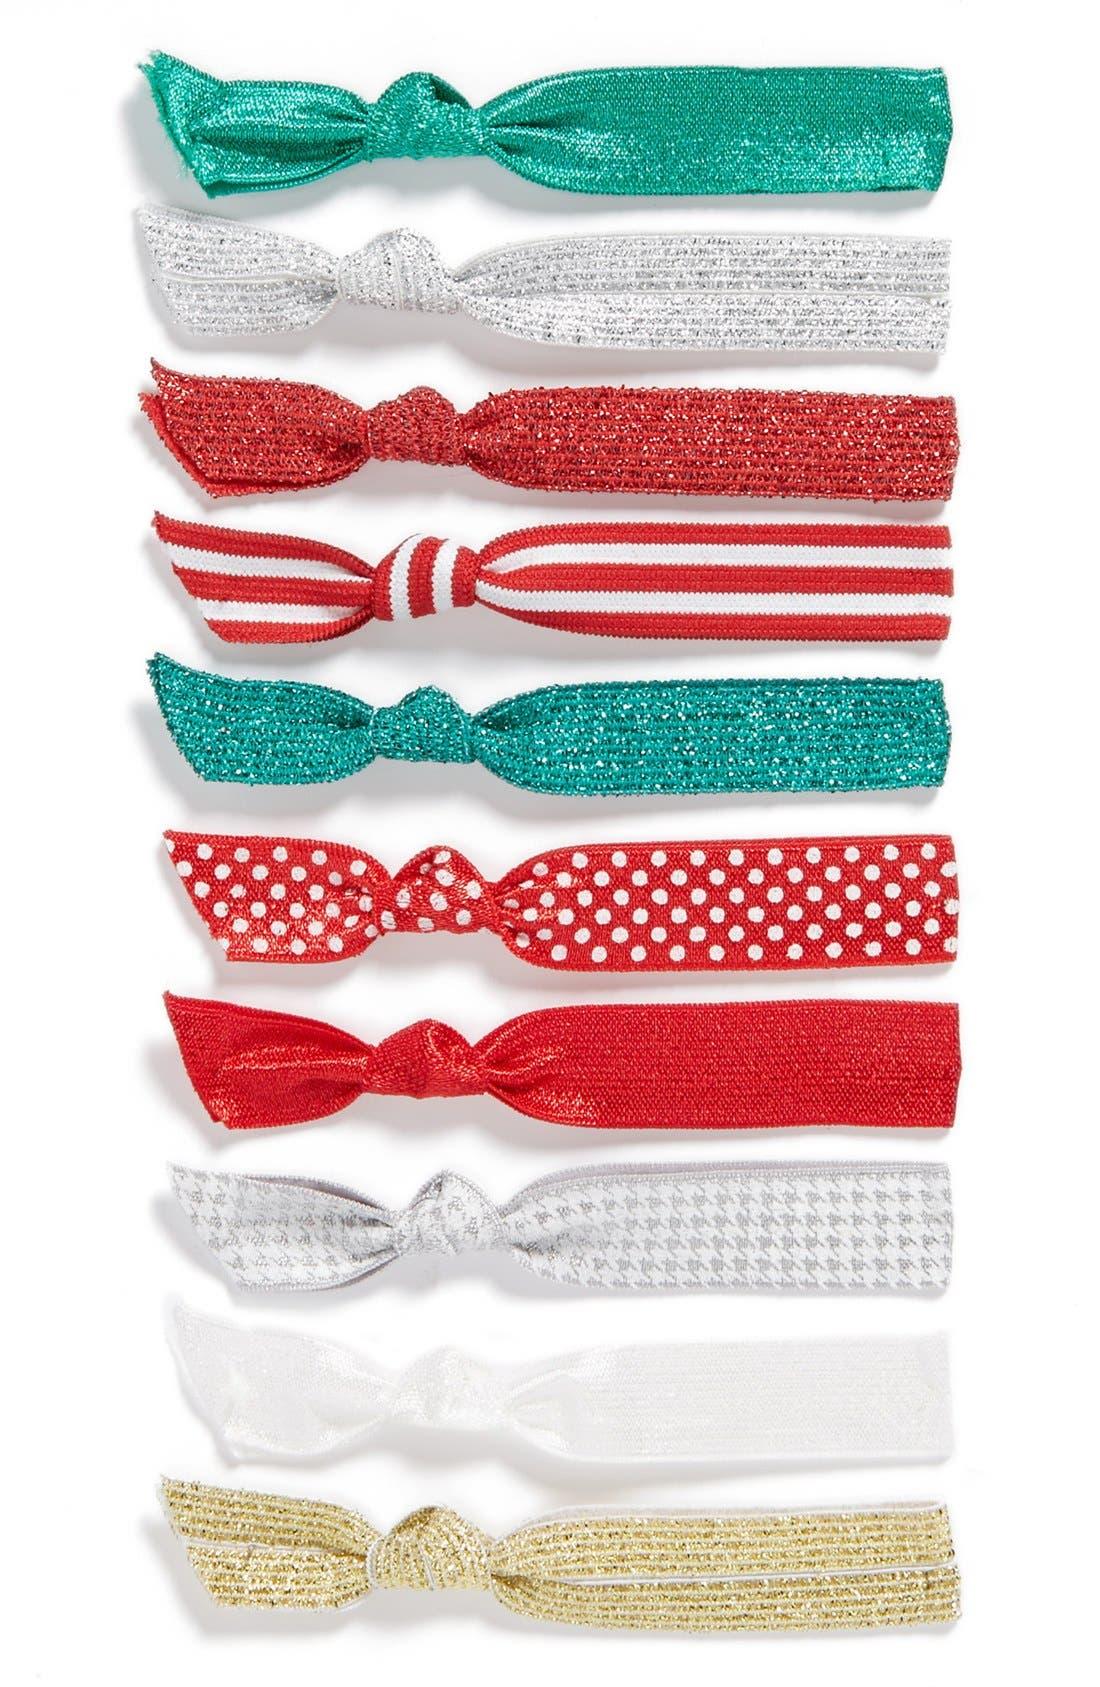 Main Image - Emi-Jay Hair Tie Ornament (Set of 10)